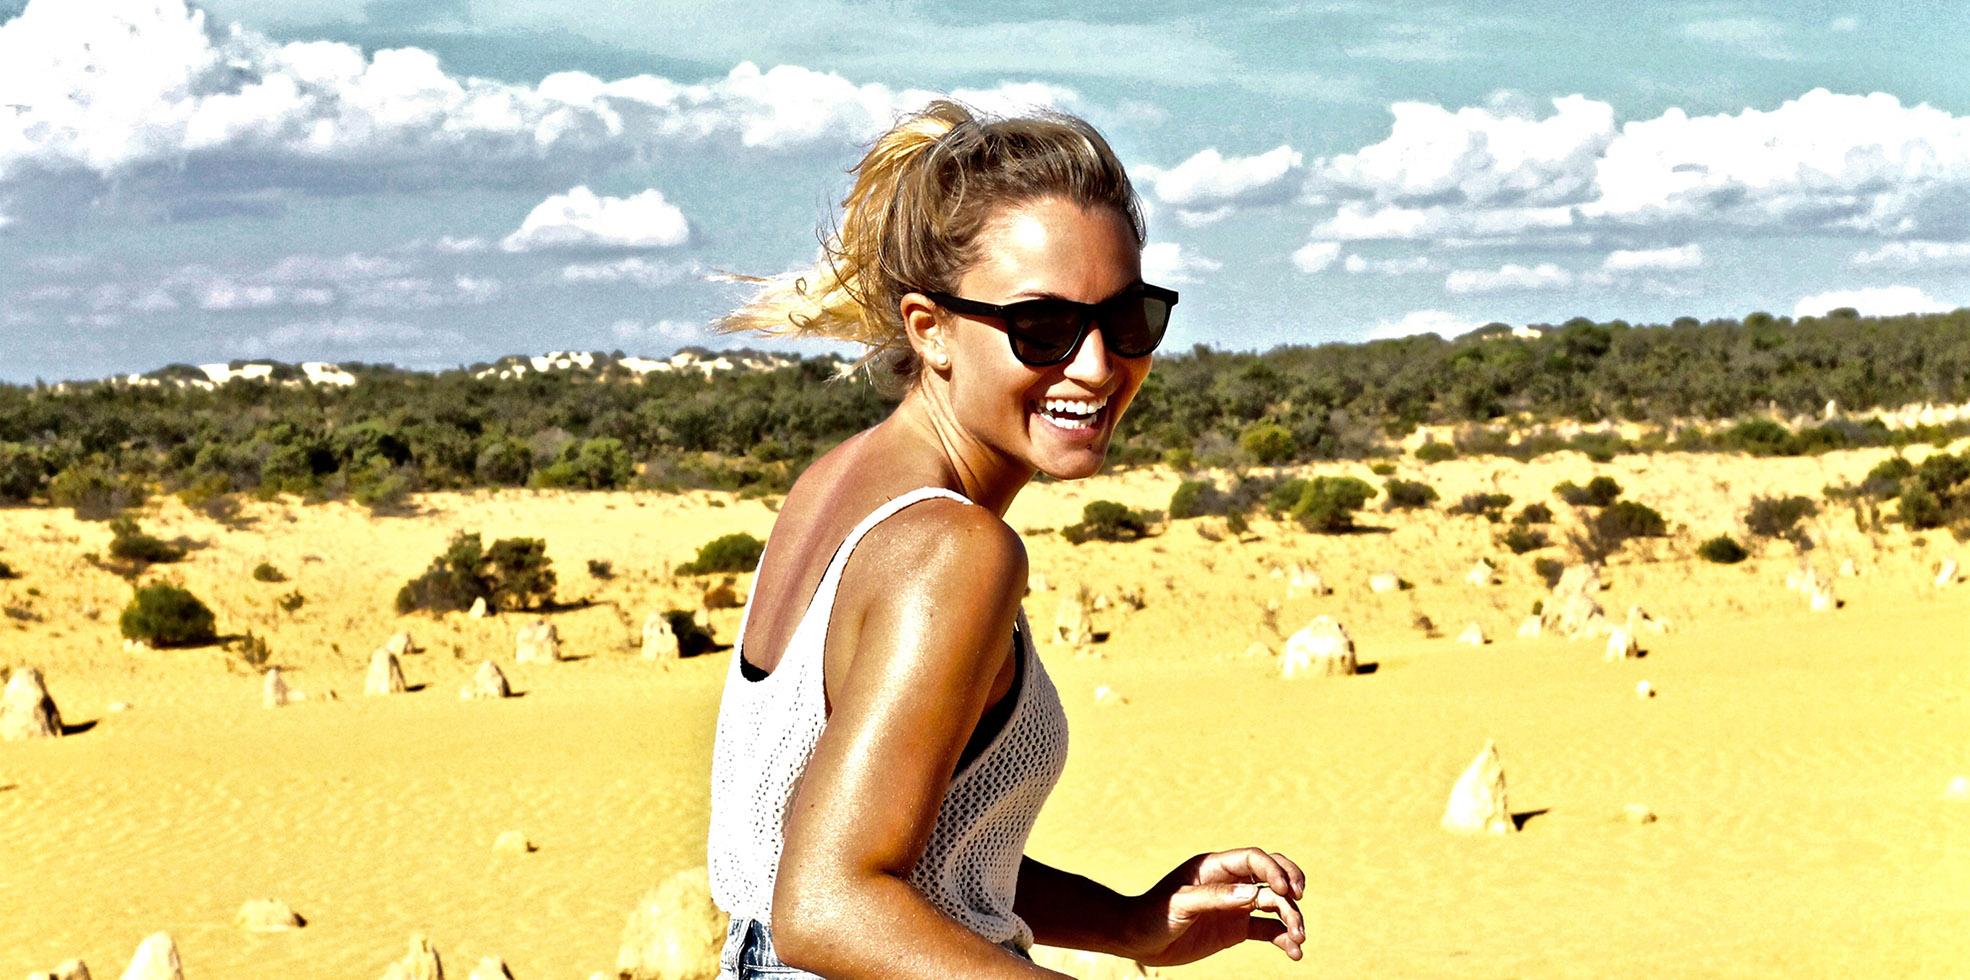 10 actiuni negative care trebuie evitate, pentru a trai o viata fericita